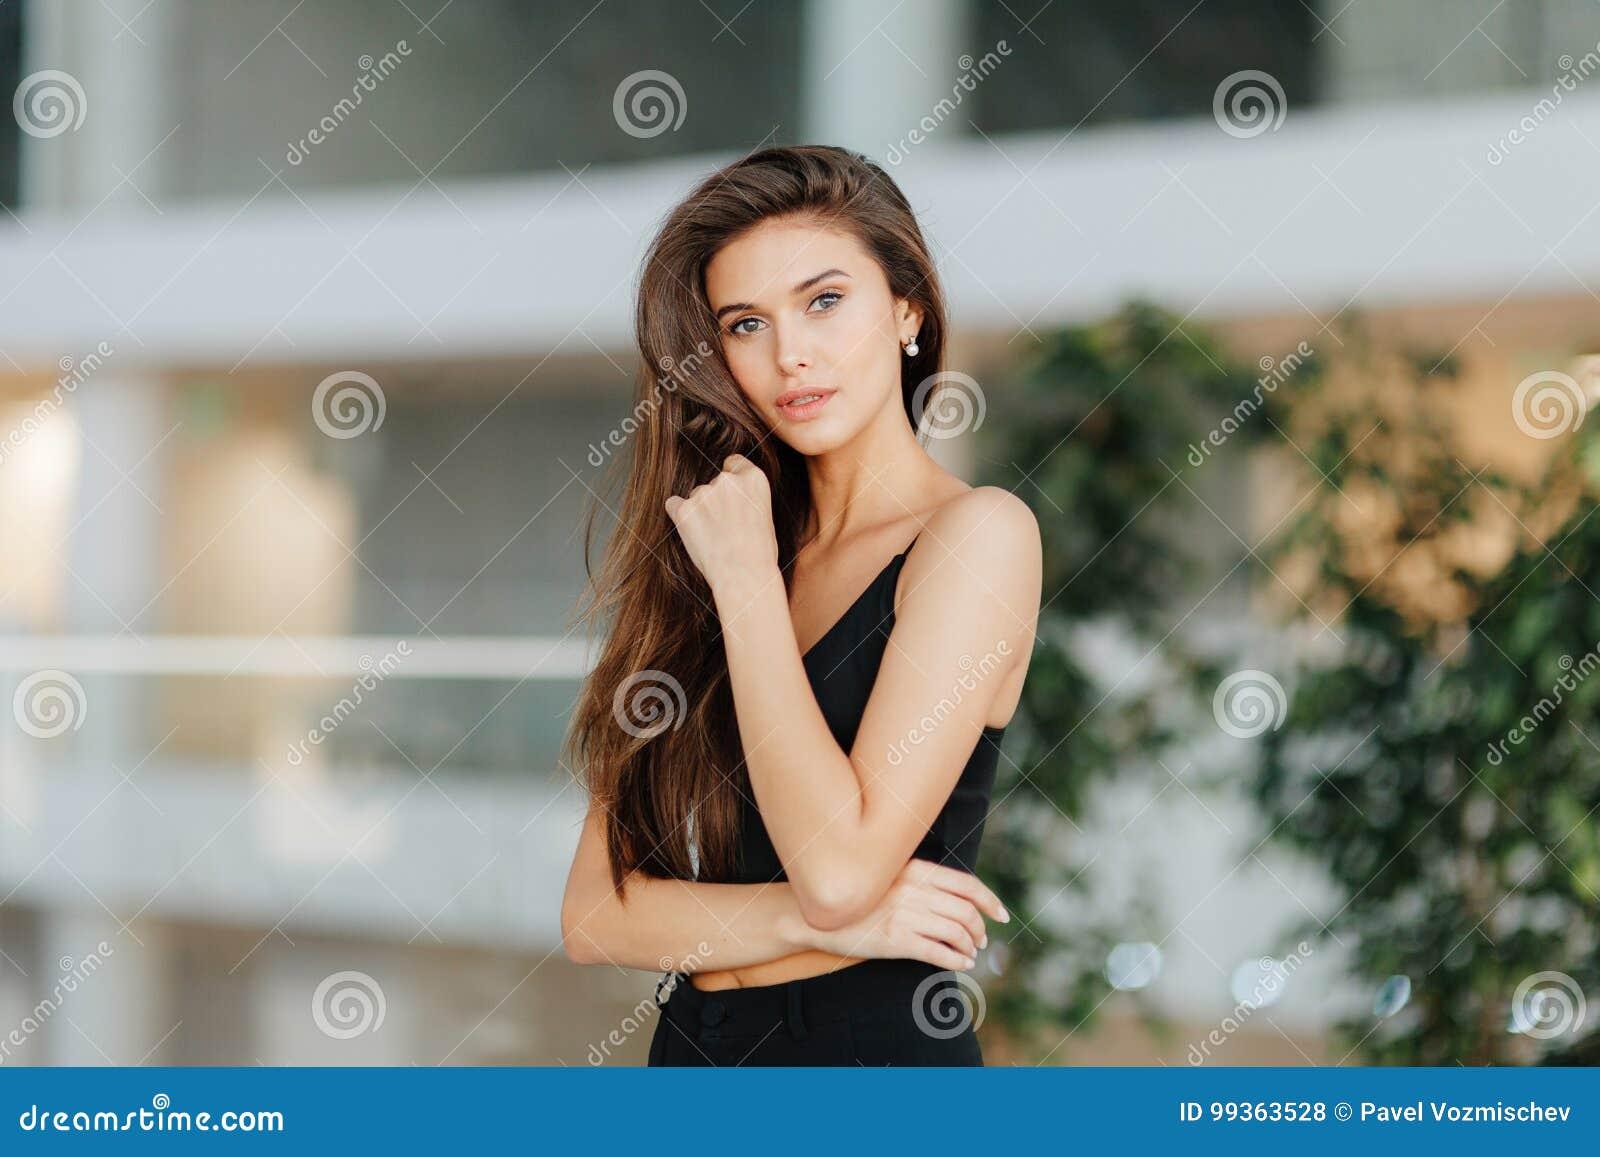 Russisch dame